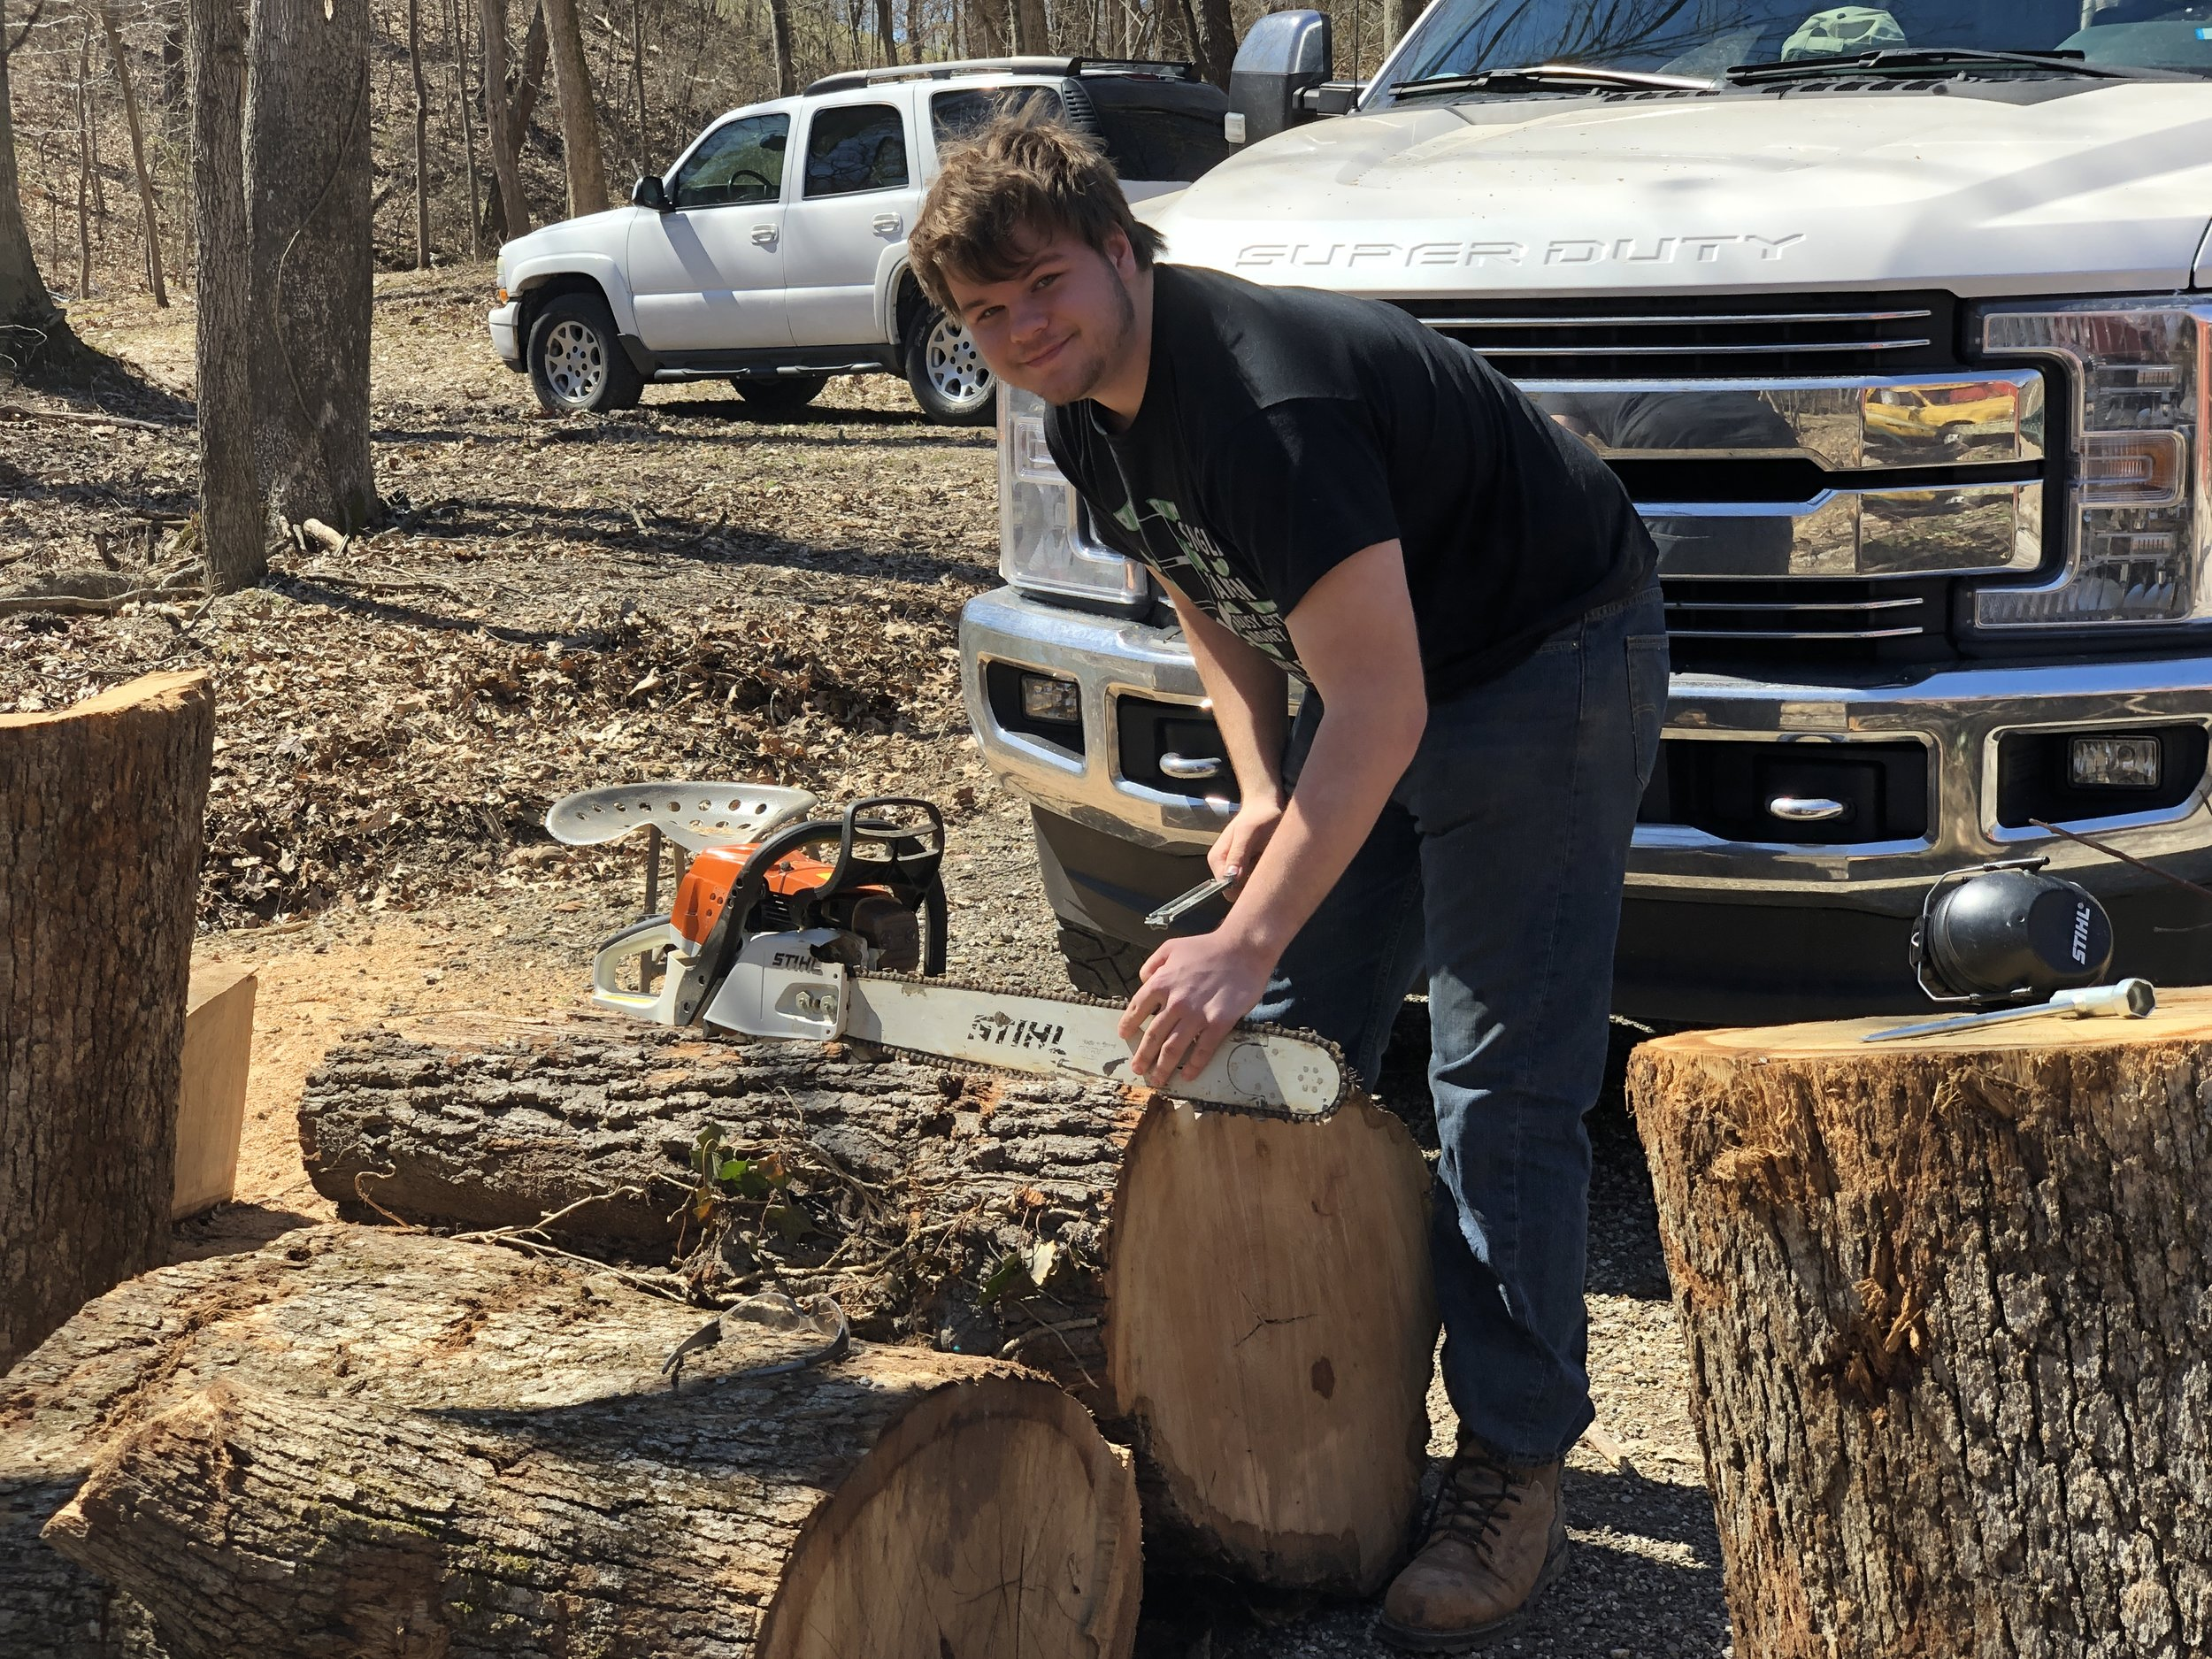 LC keeping the saws sharp (and looking kinda homeless ;-) )